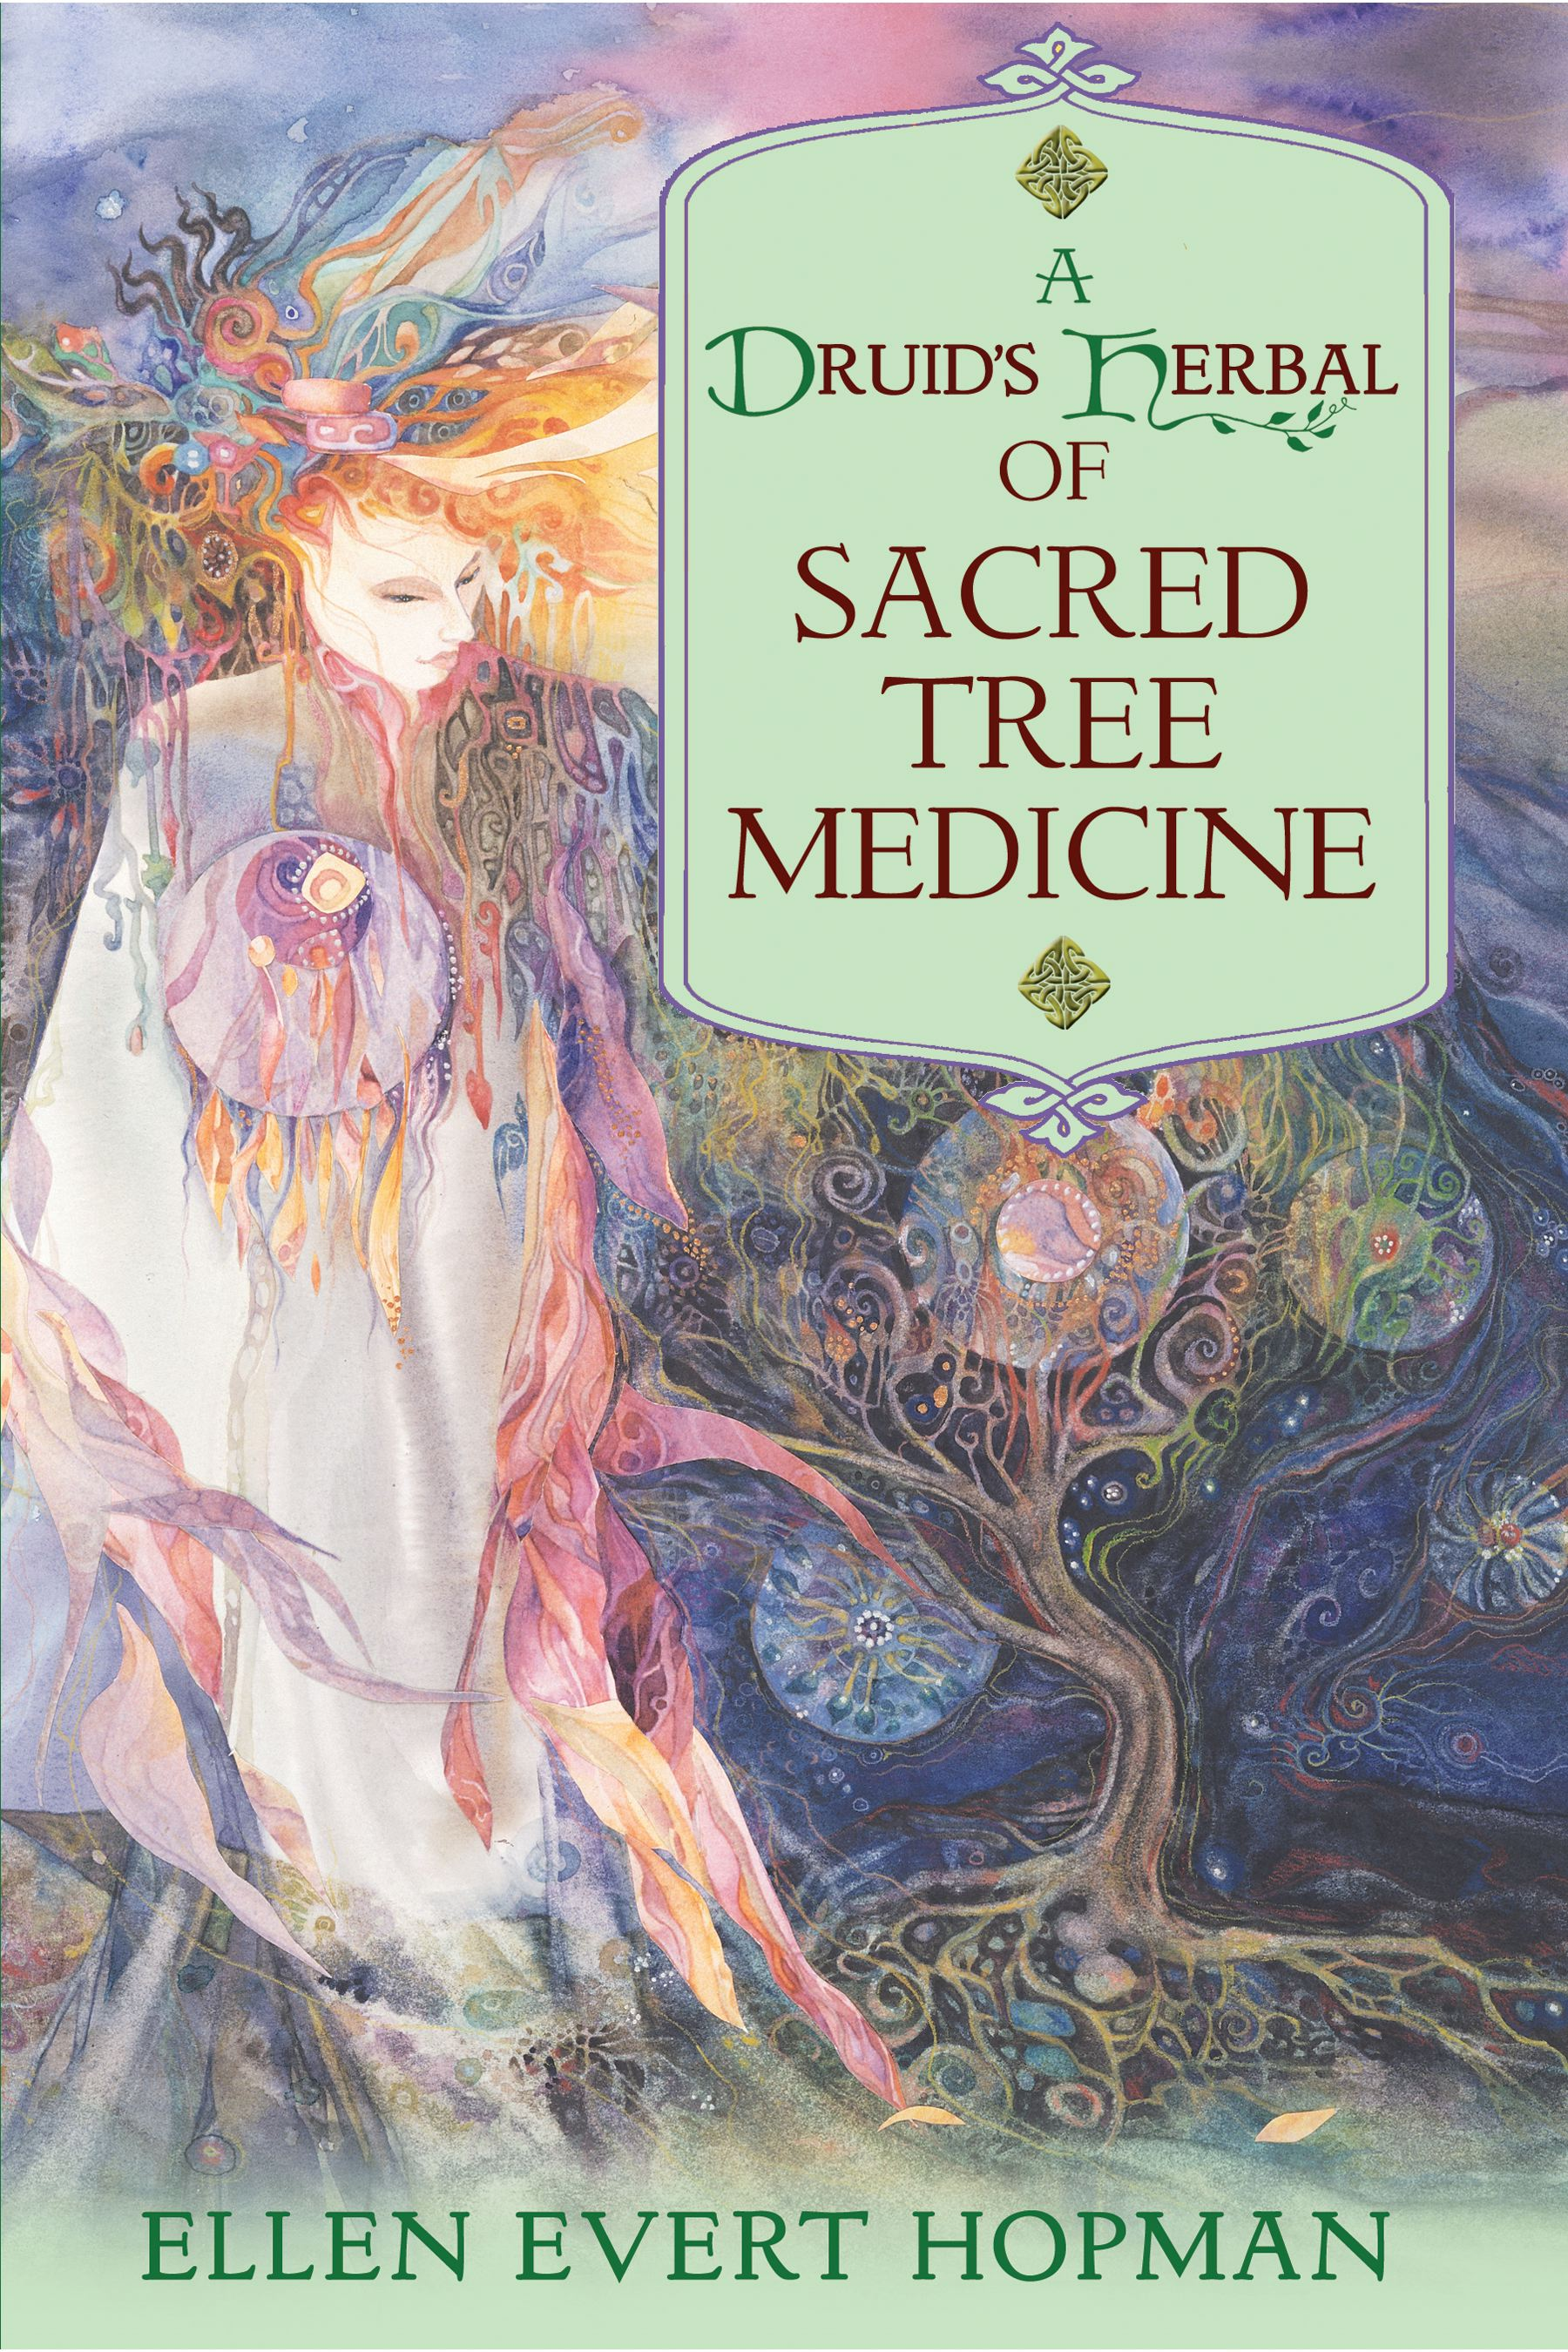 A druids herbal of sacred tree medicine 9781594772306 hr